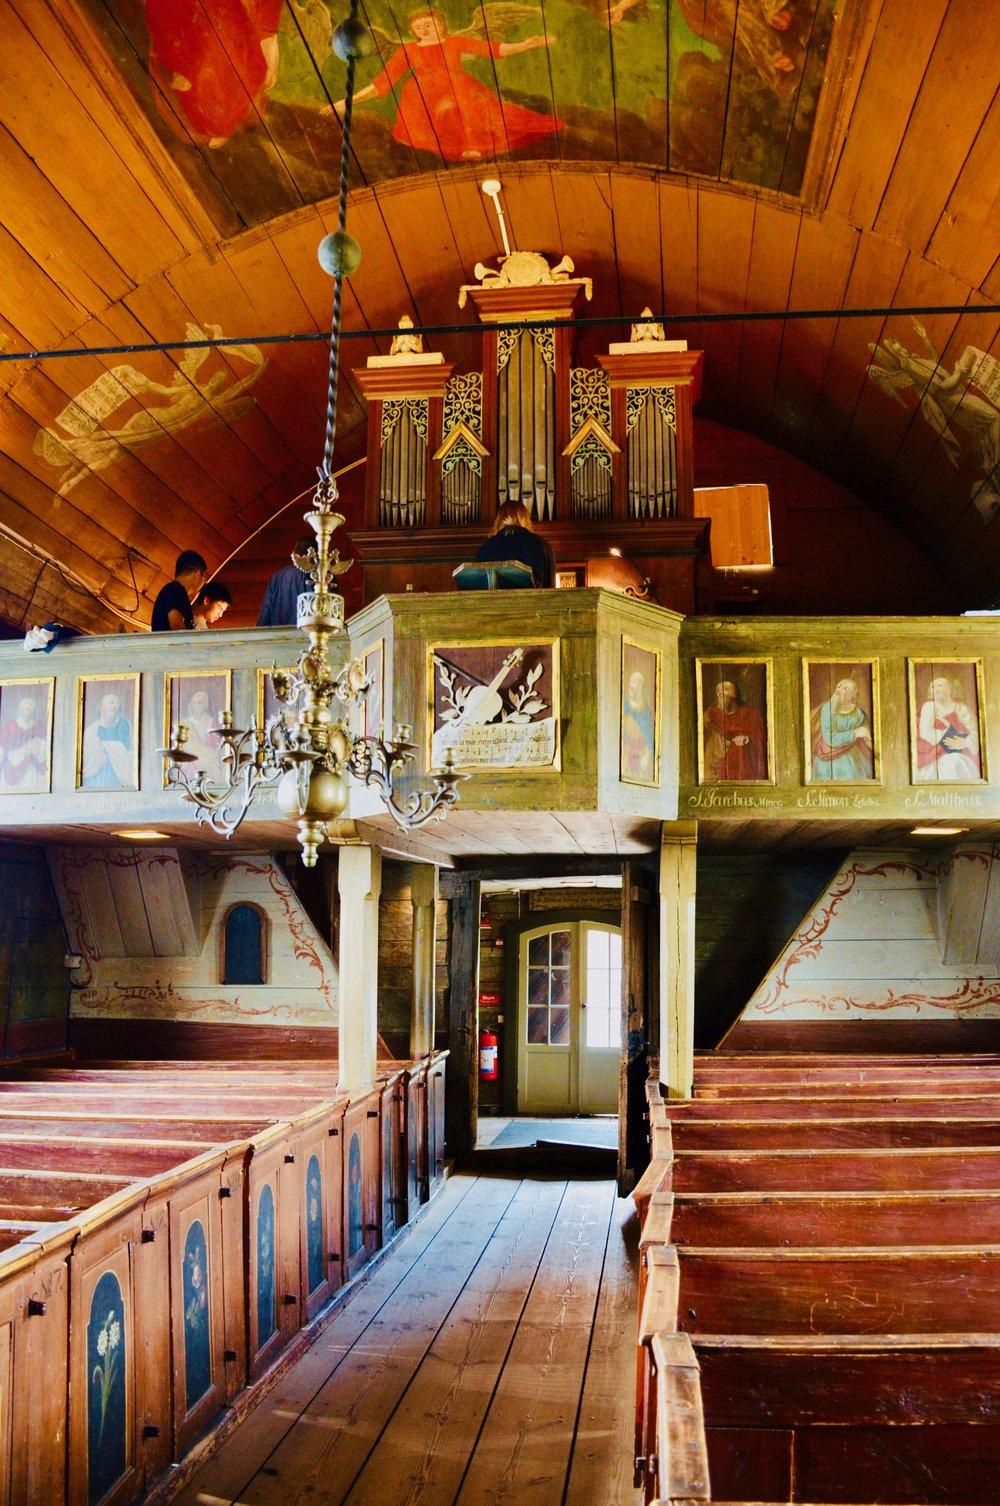 The historic organ in the 1652 chapel, Kulturen, Lund, Sweden.